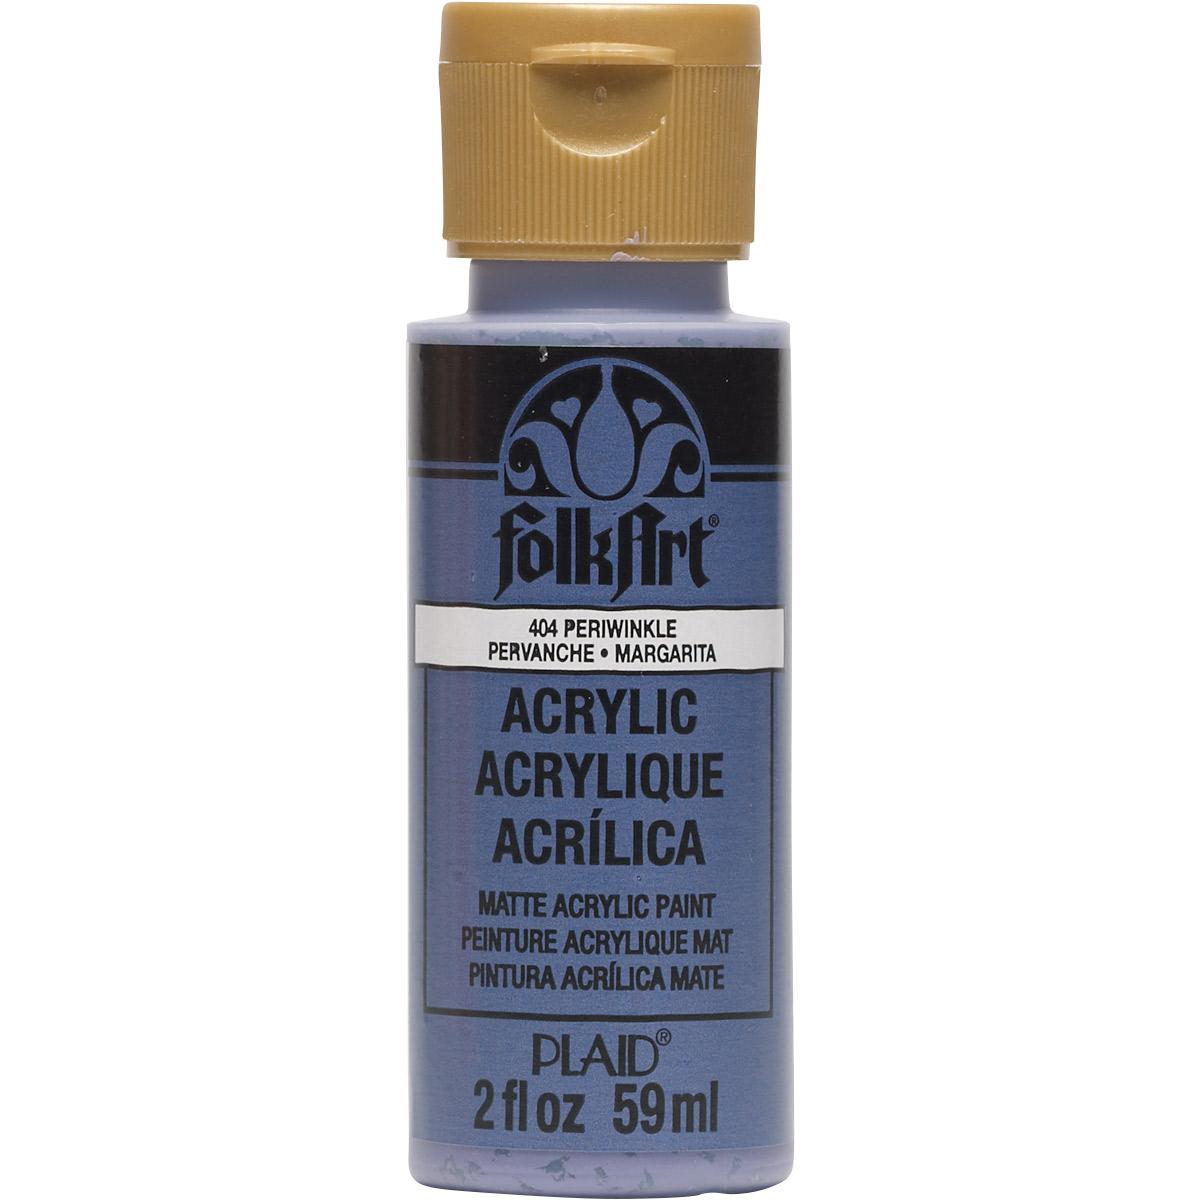 FolkArt ® Acrylic Colors - Periwinkle, 2 oz. - 404